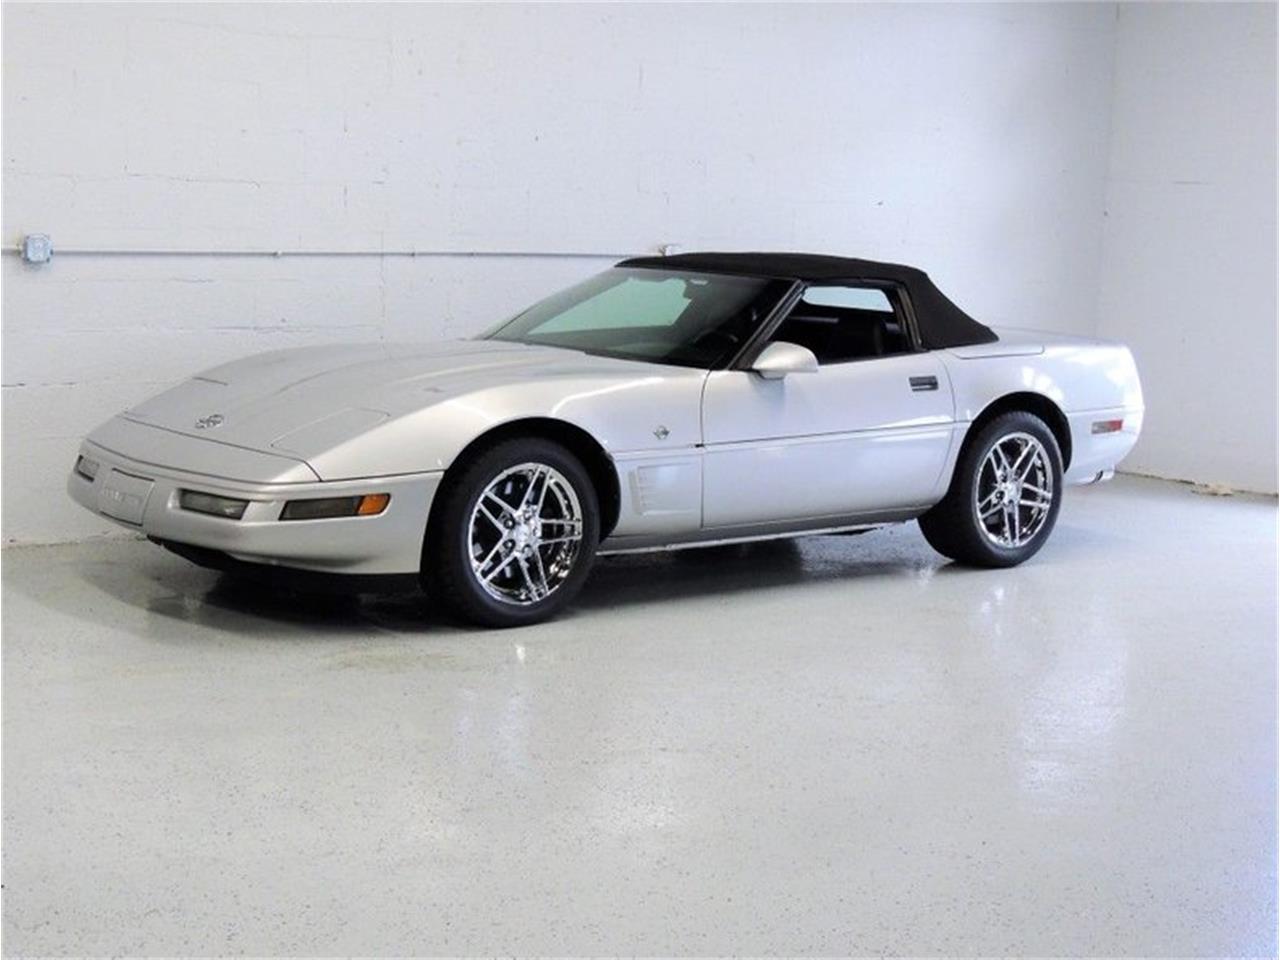 1996 Chevrolet Corvette (CC-1413274) for sale in Punta Gorda, Florida